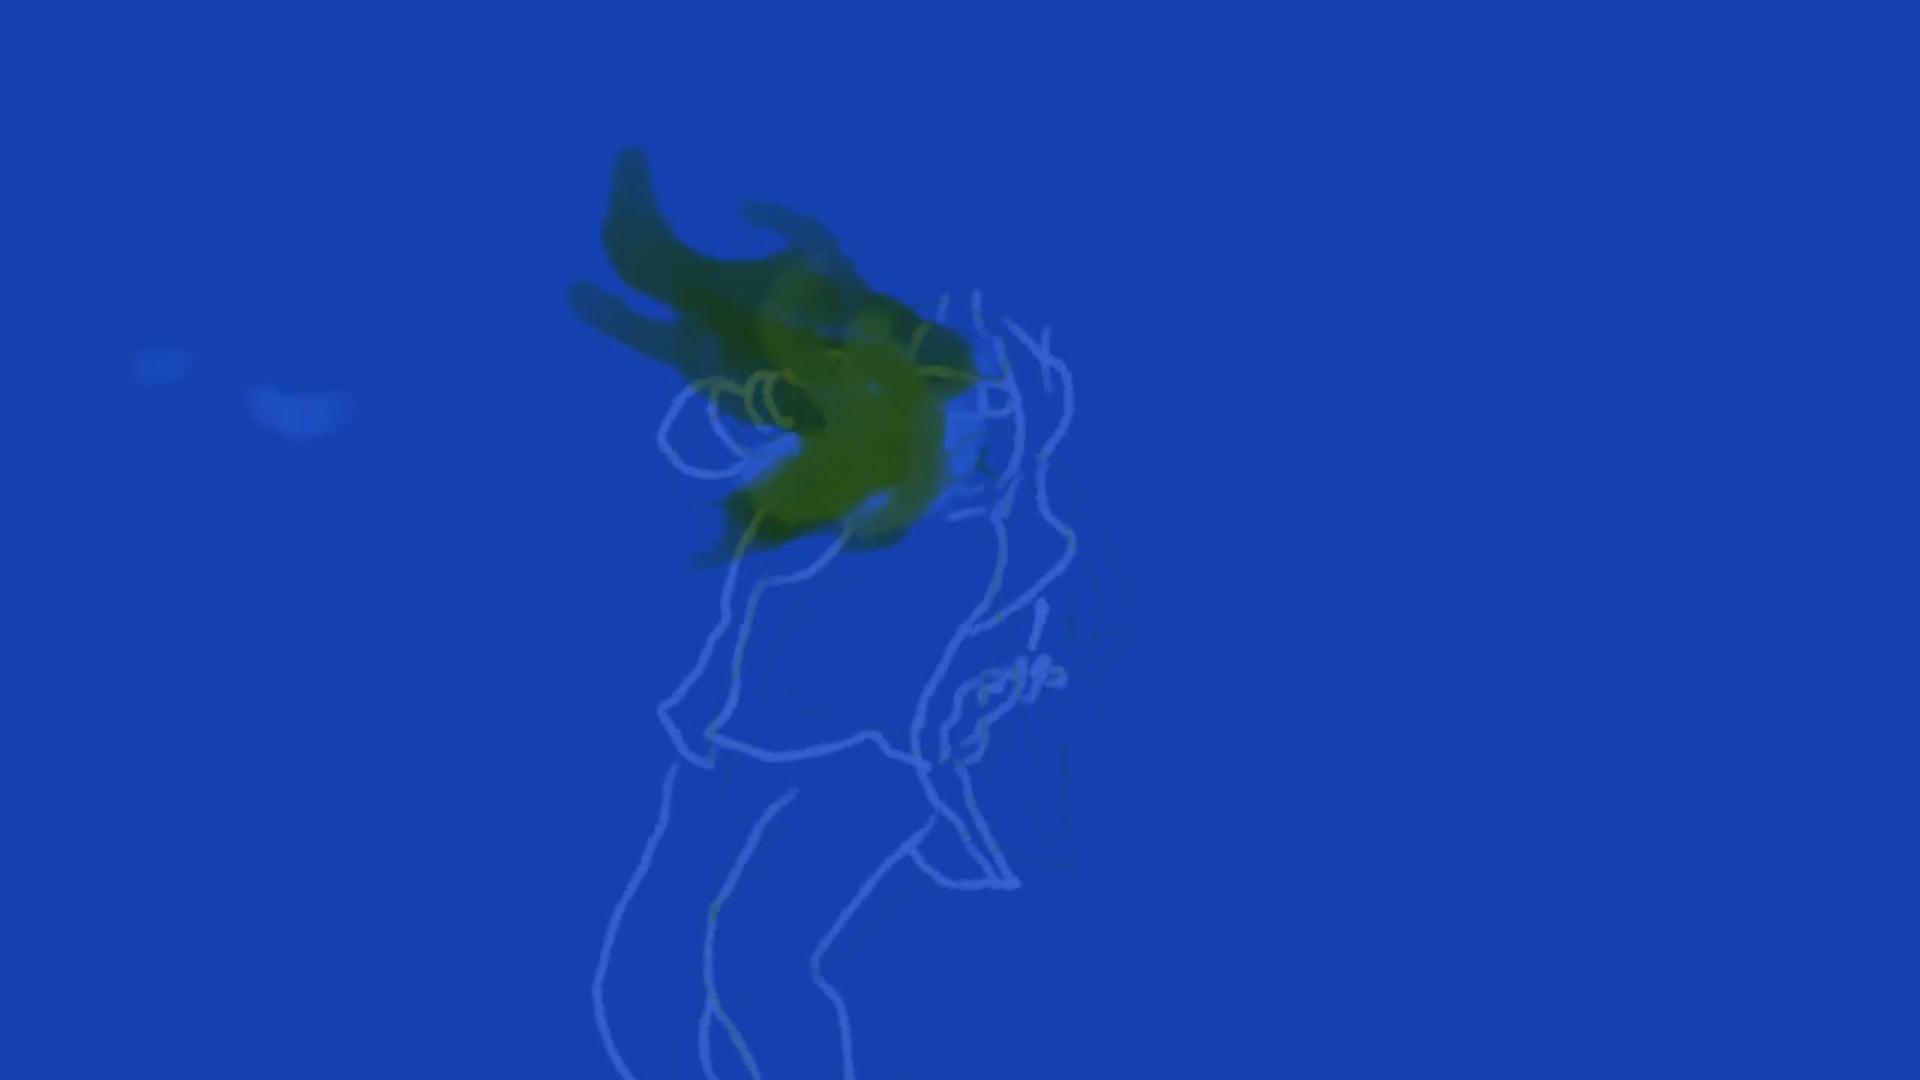 dance rotoscope animation